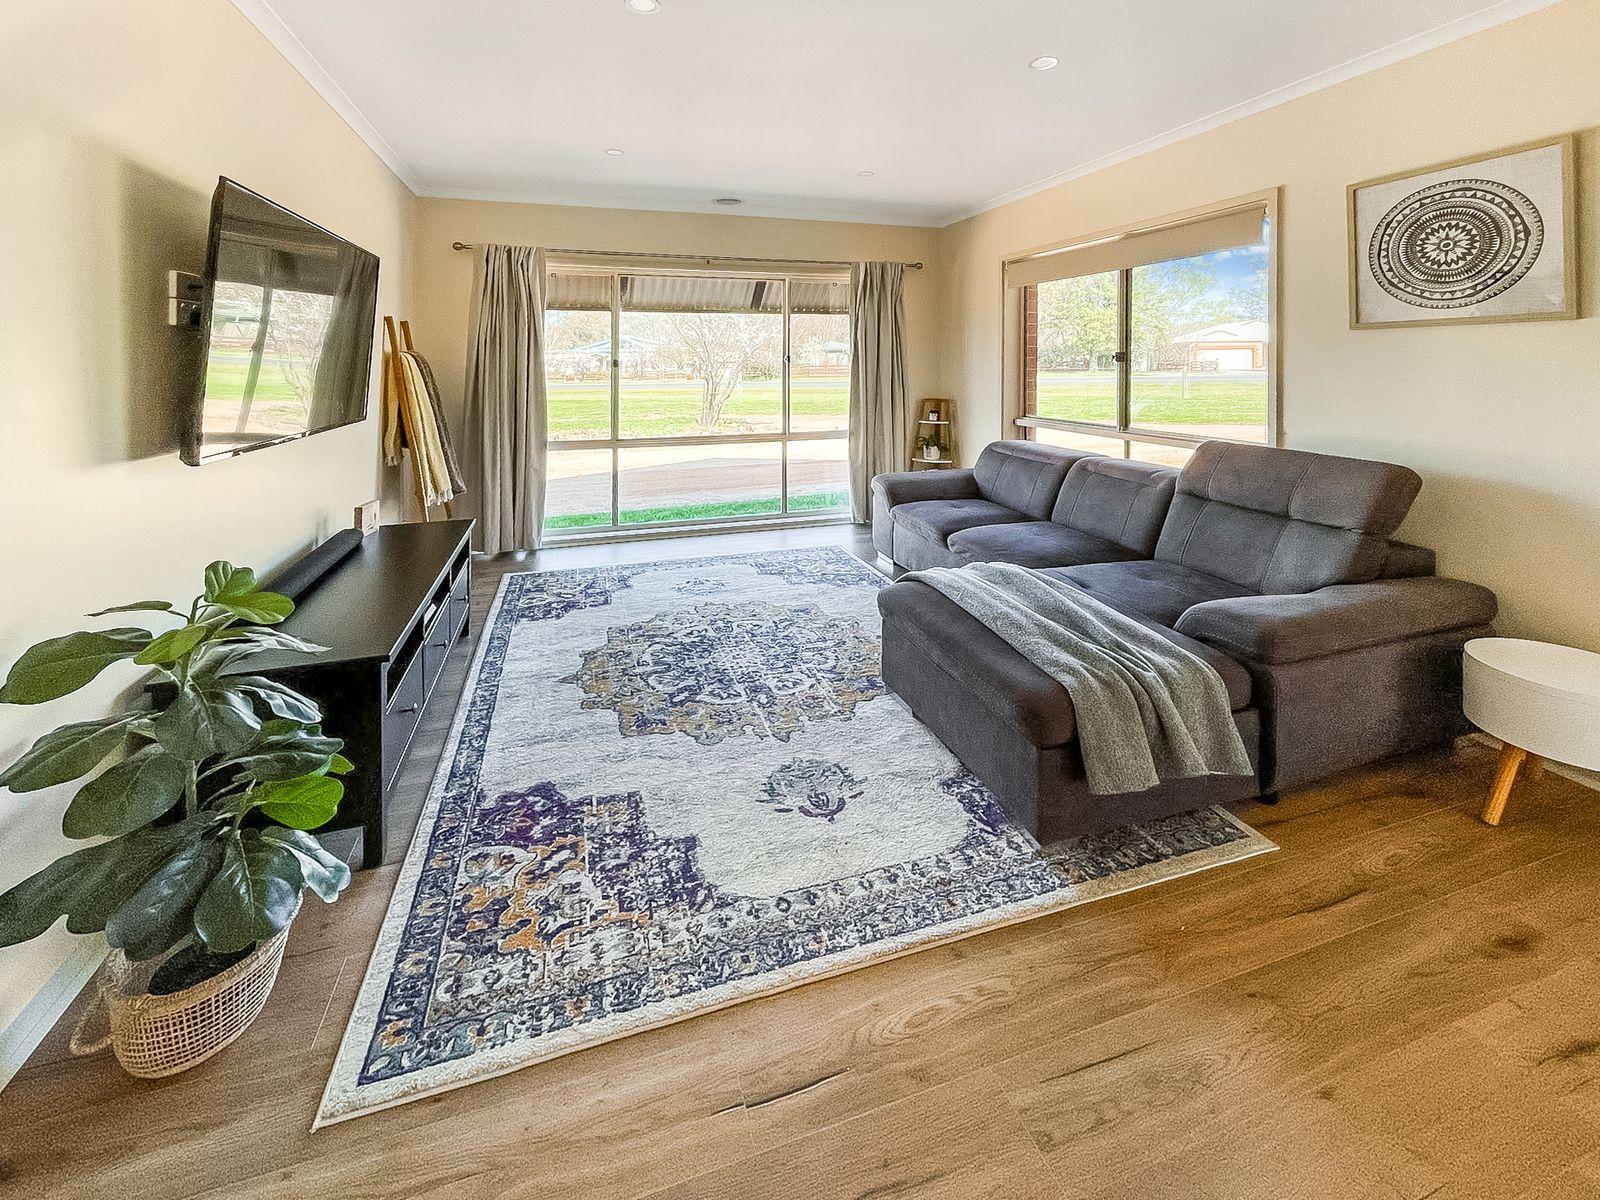 1 Cooper Grove, Strathfieldsaye, VIC 3551